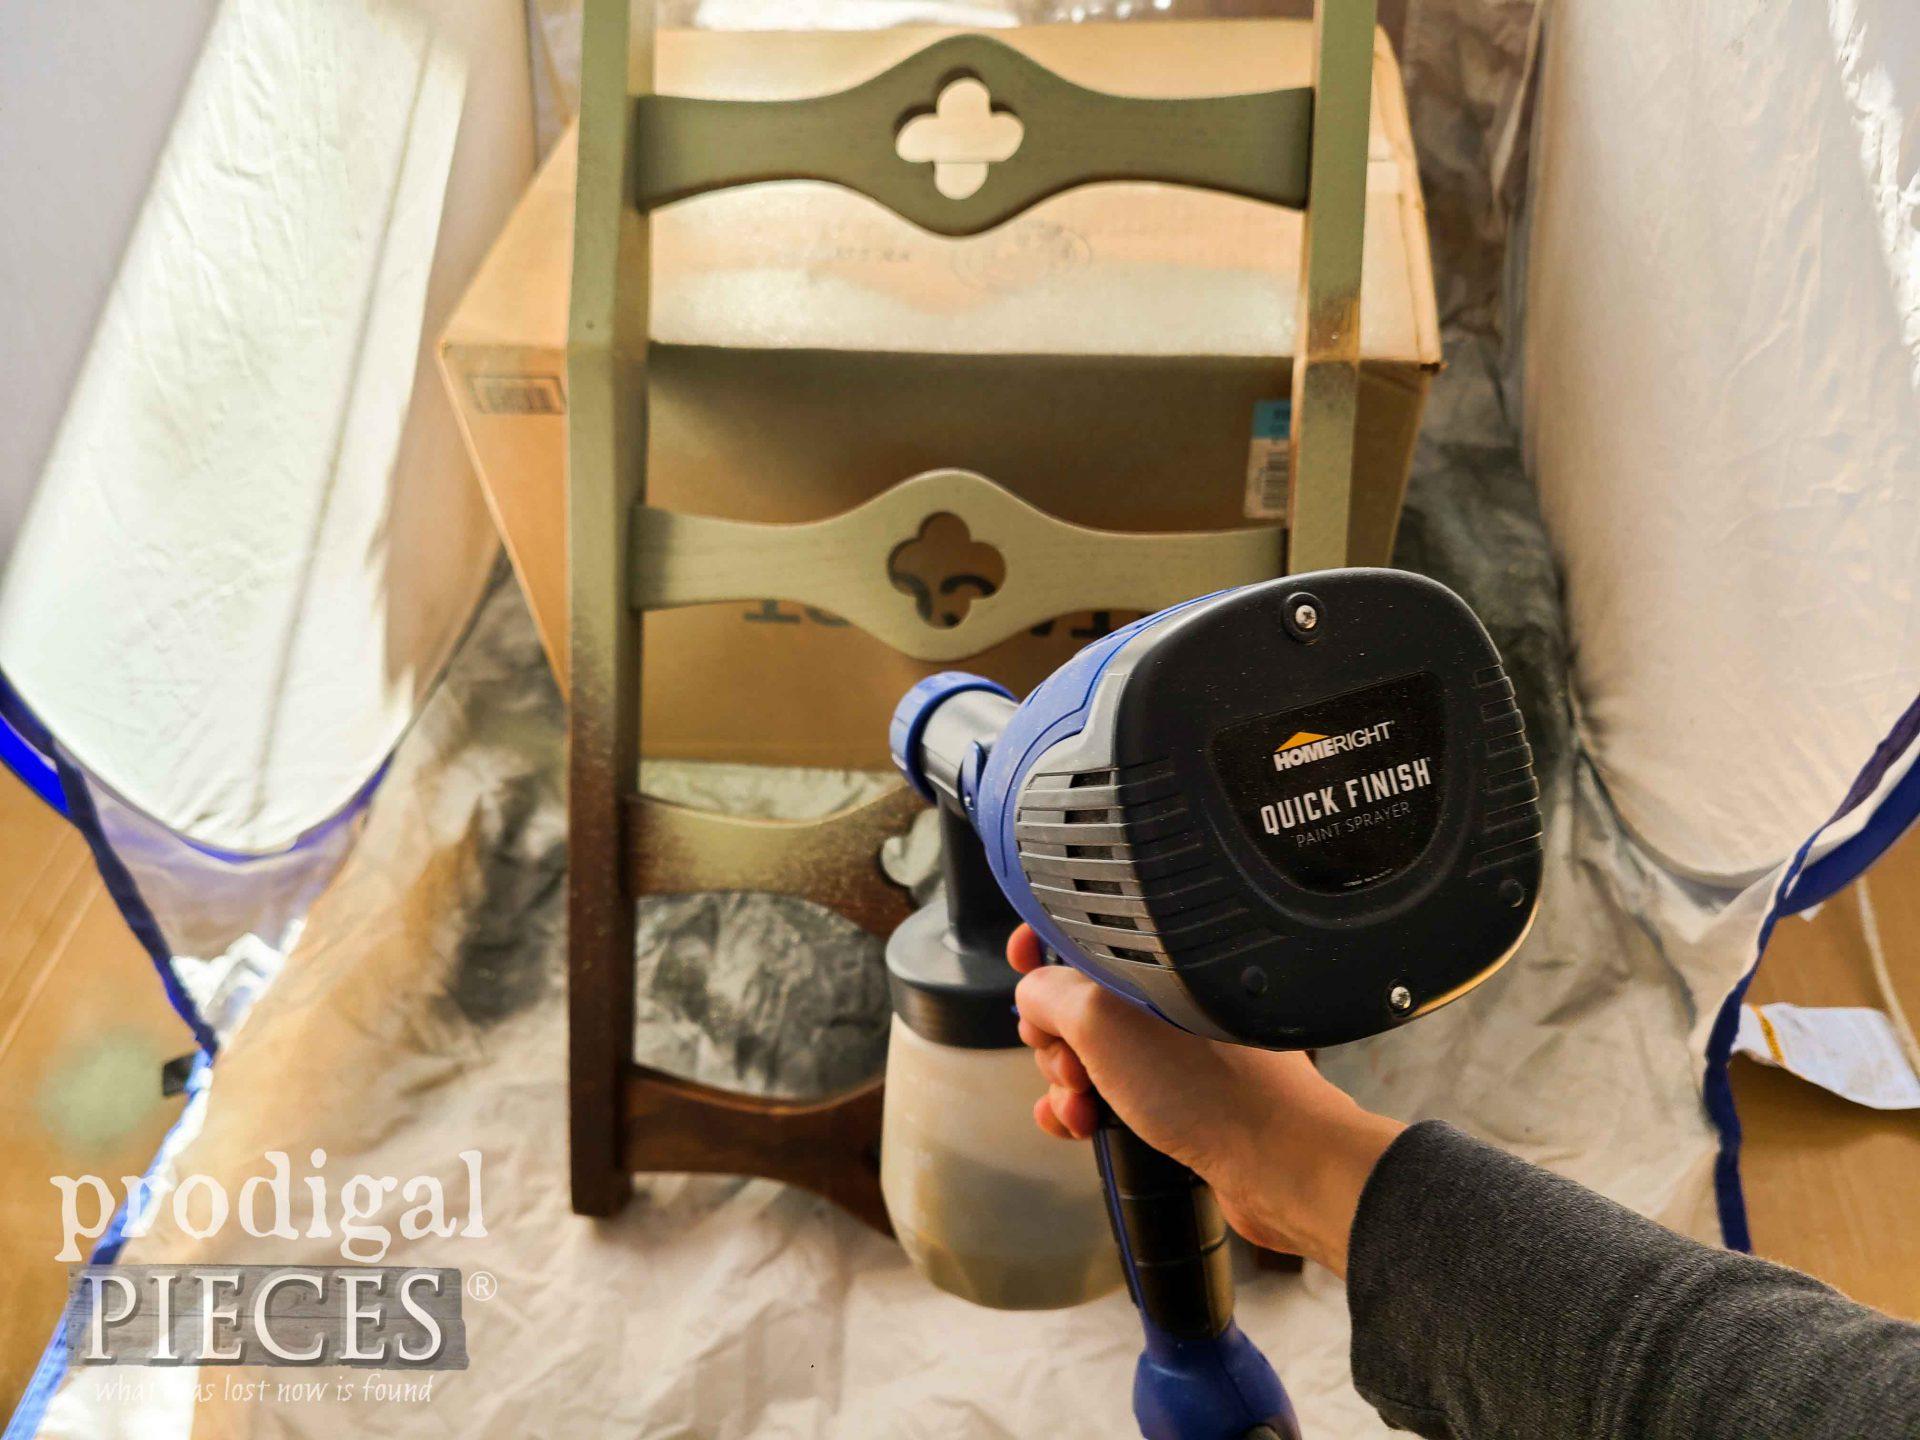 HomeRight Quick Finish Sprayer for Salvaged Spring Decor by Larissa of Prodigal Pieces | prodigalpieces.com #prodigalpieces